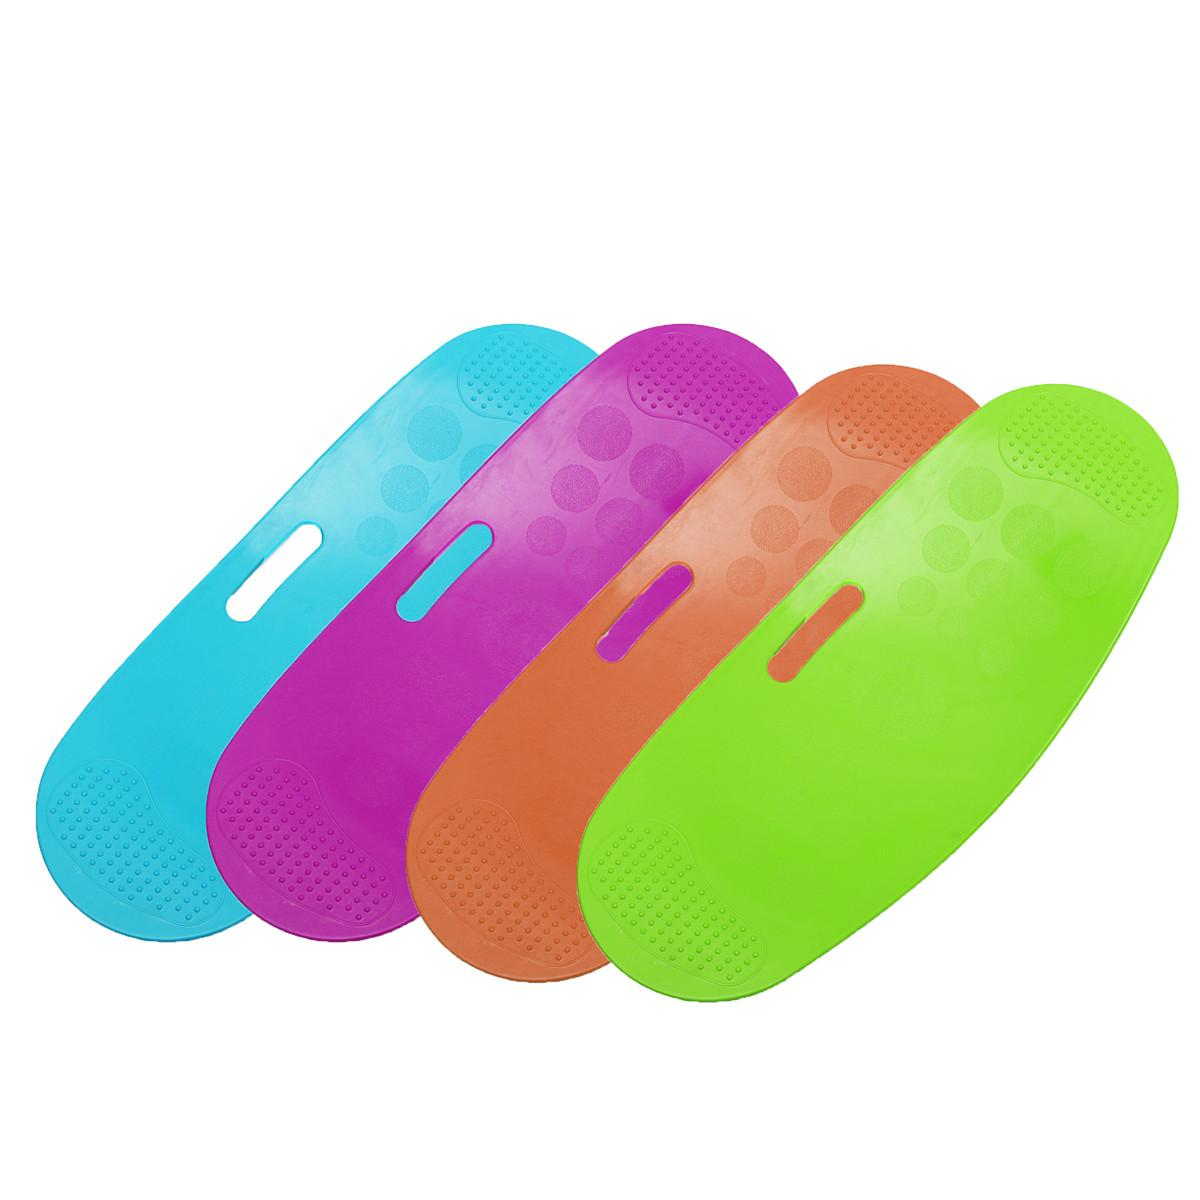 ABS Twisting Balança Board simples Núcleo Workout Yoga Twister Treinamento Abdominal Músculos Pernas Balance Pad Prancha de Fitness